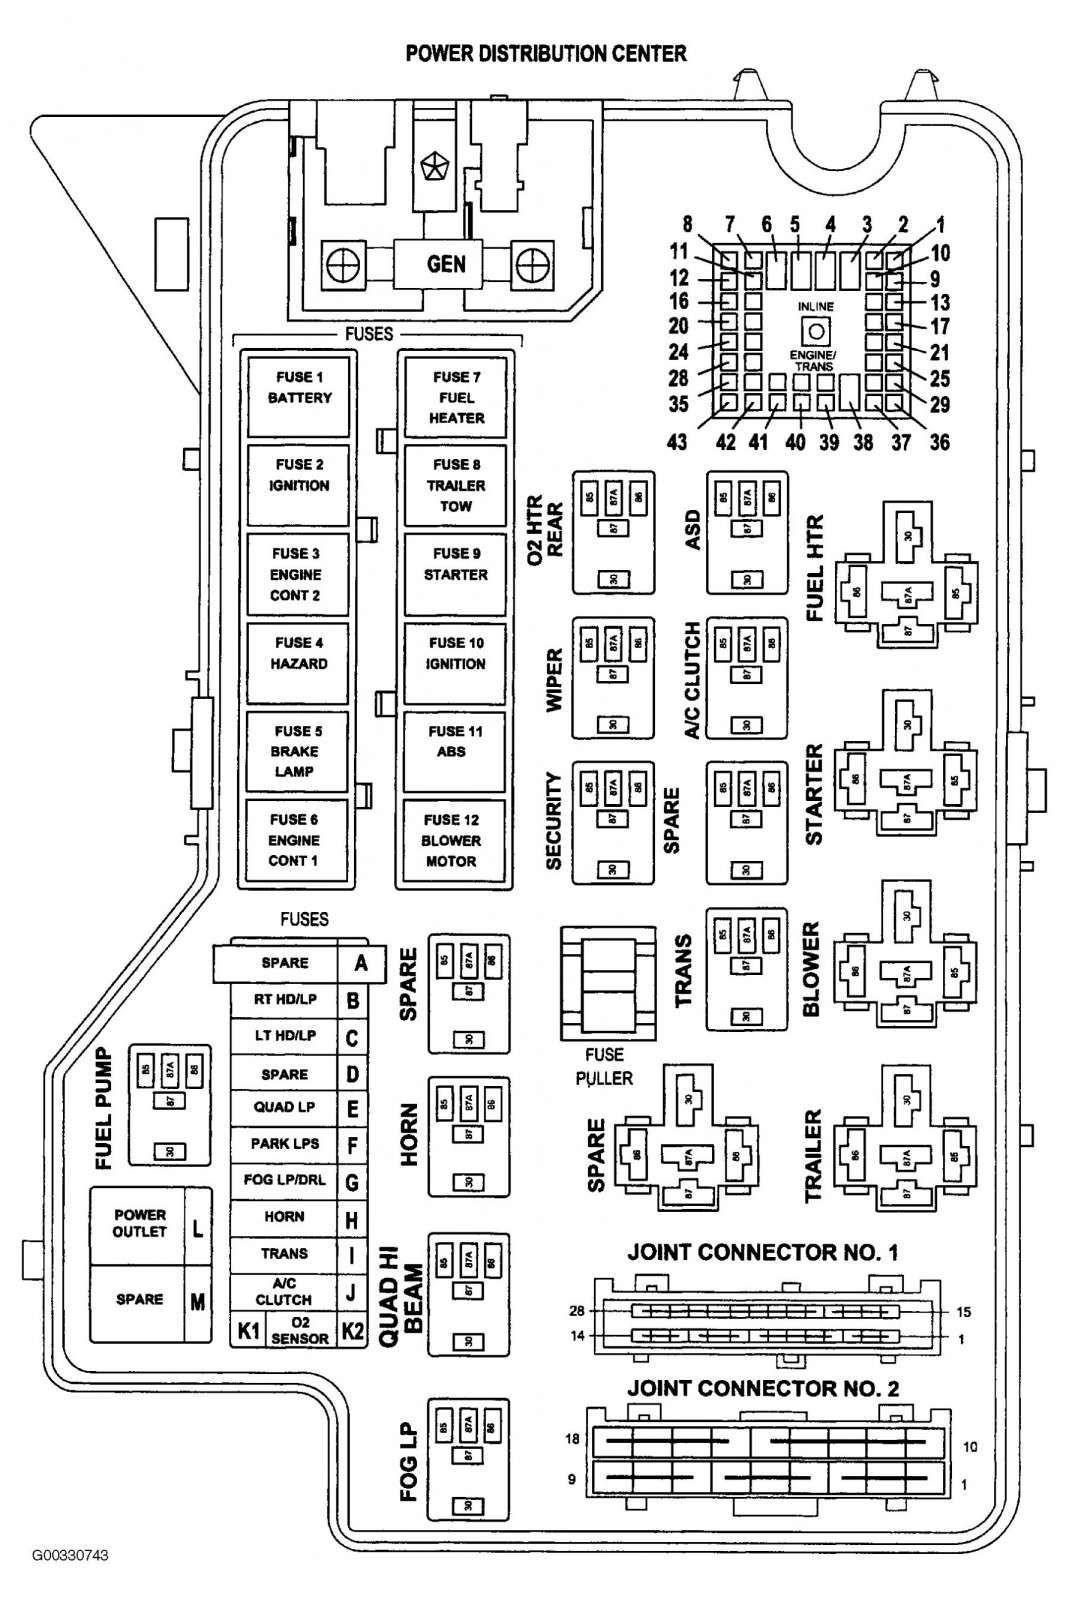 Dodge Ram Tail Light Wireing Diogram